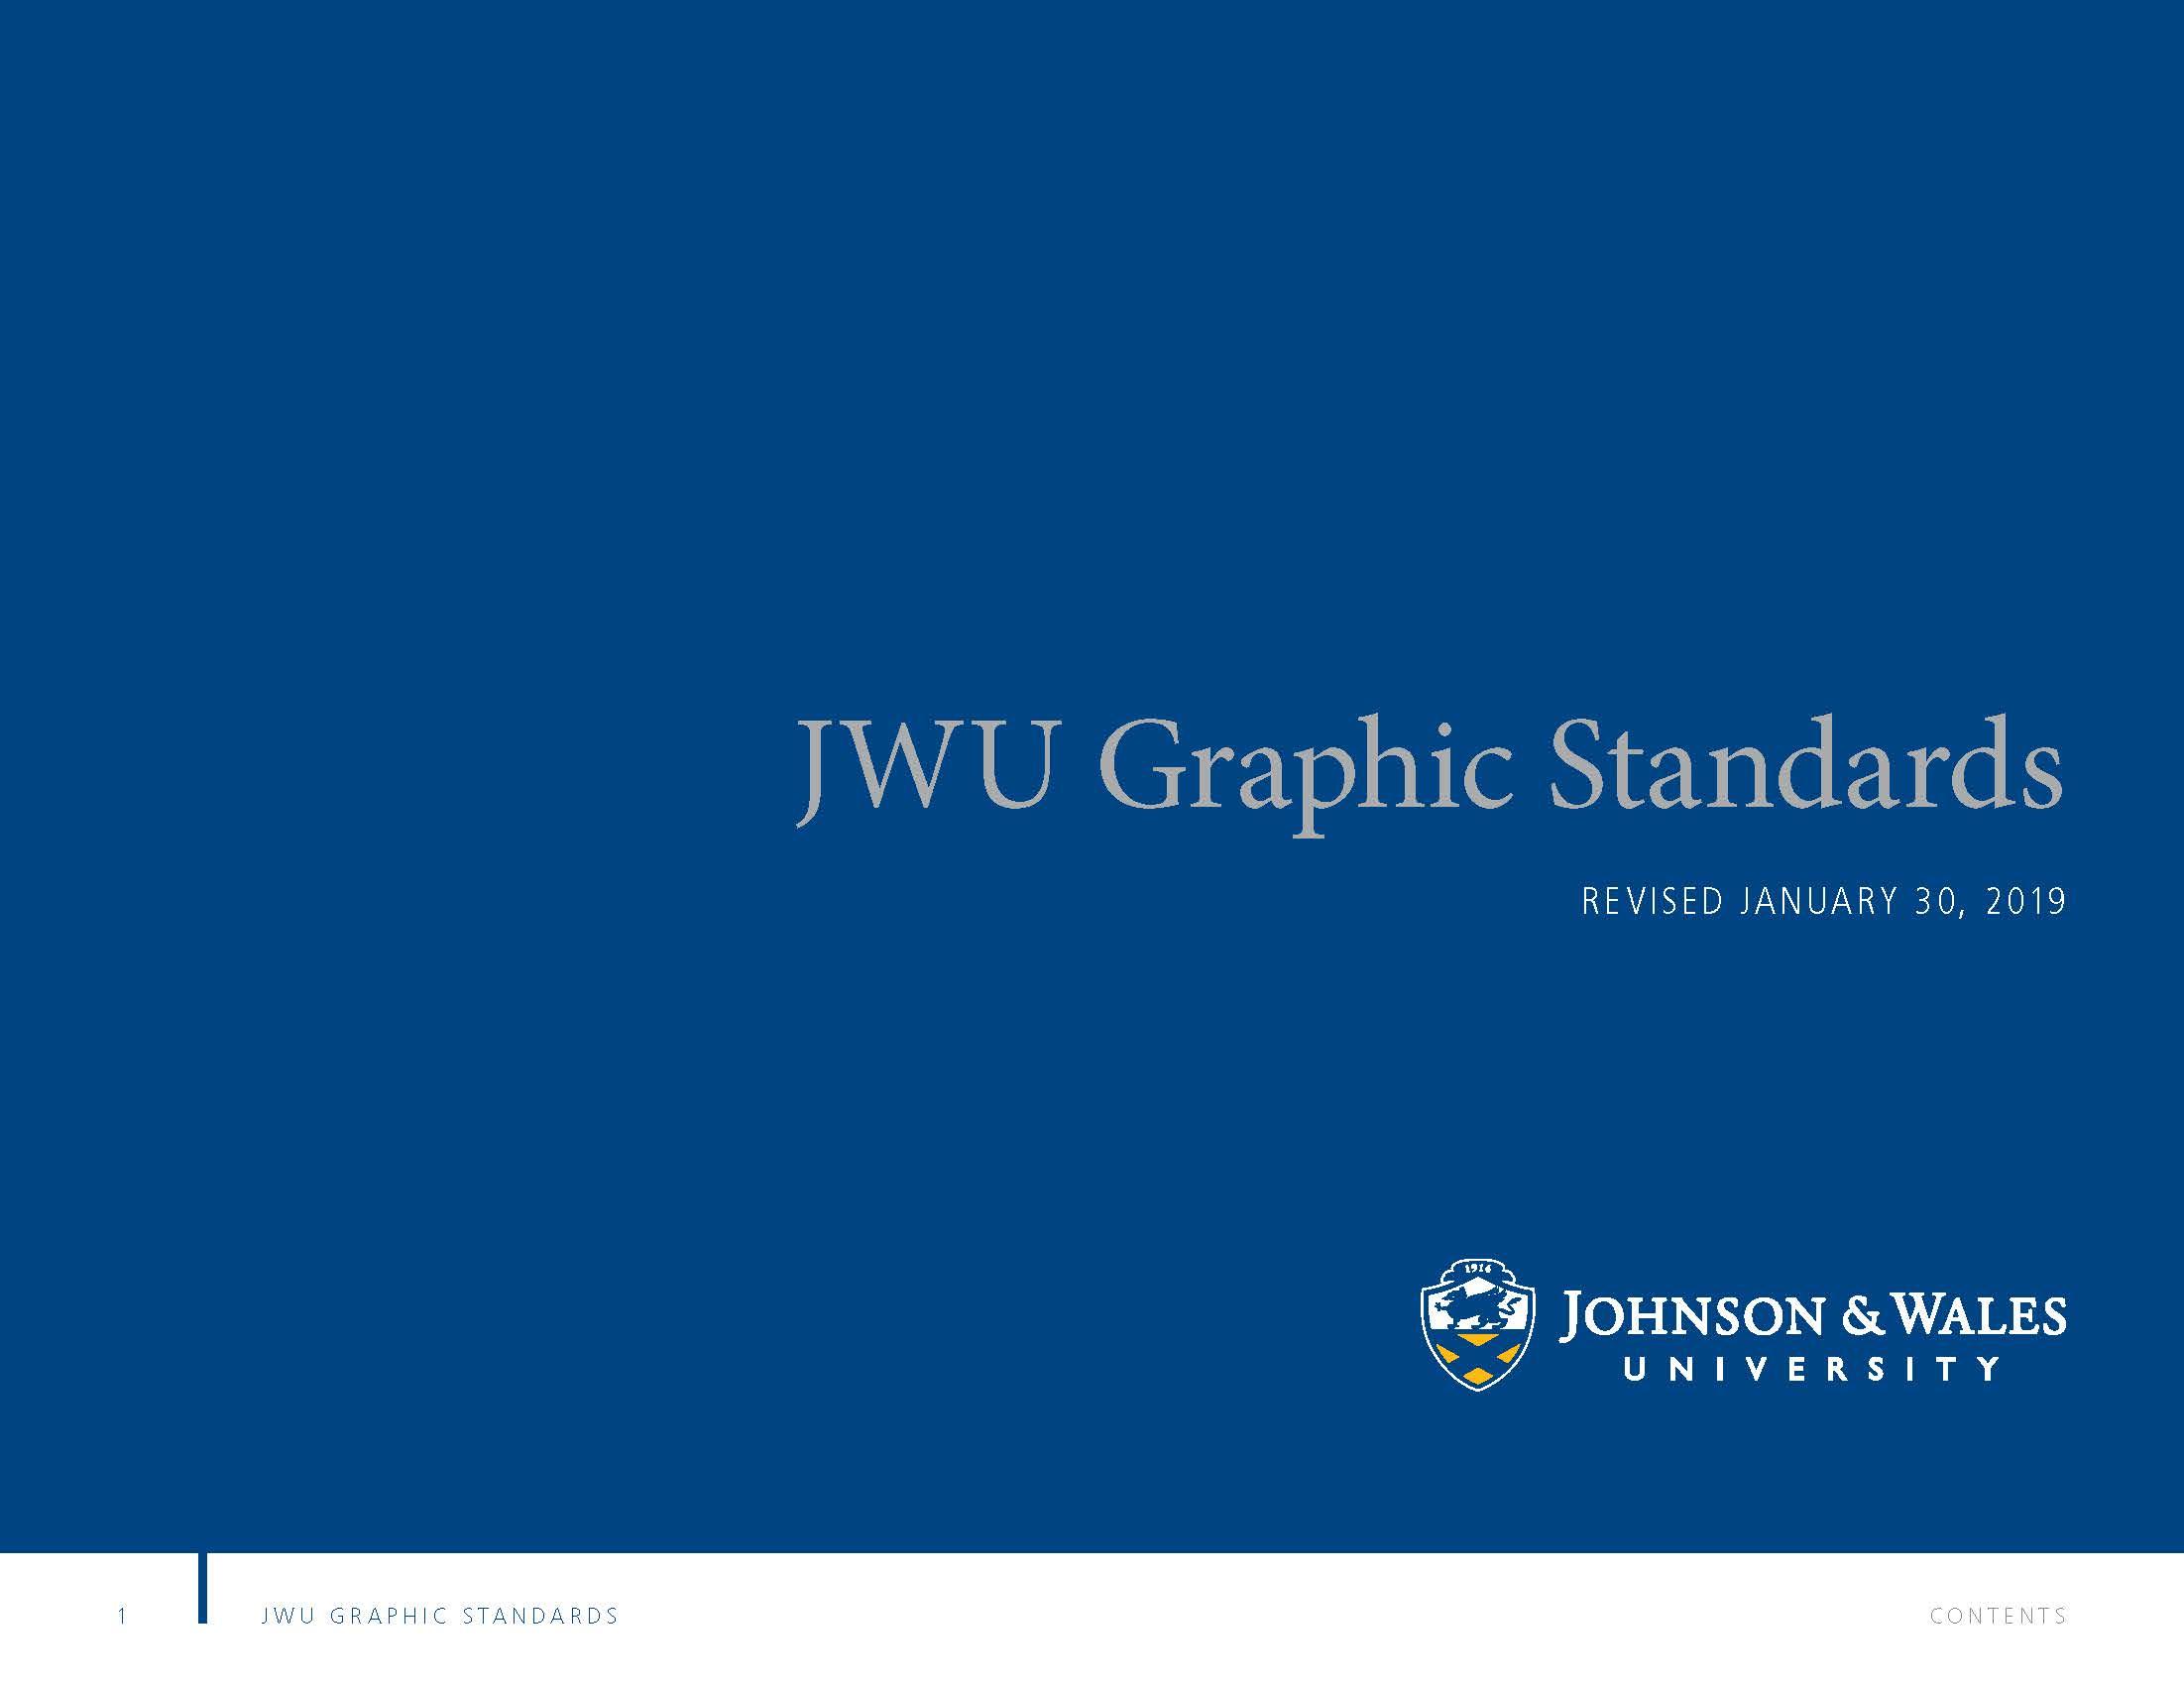 JWU Graphic Standard_01-30-19 1.jpg